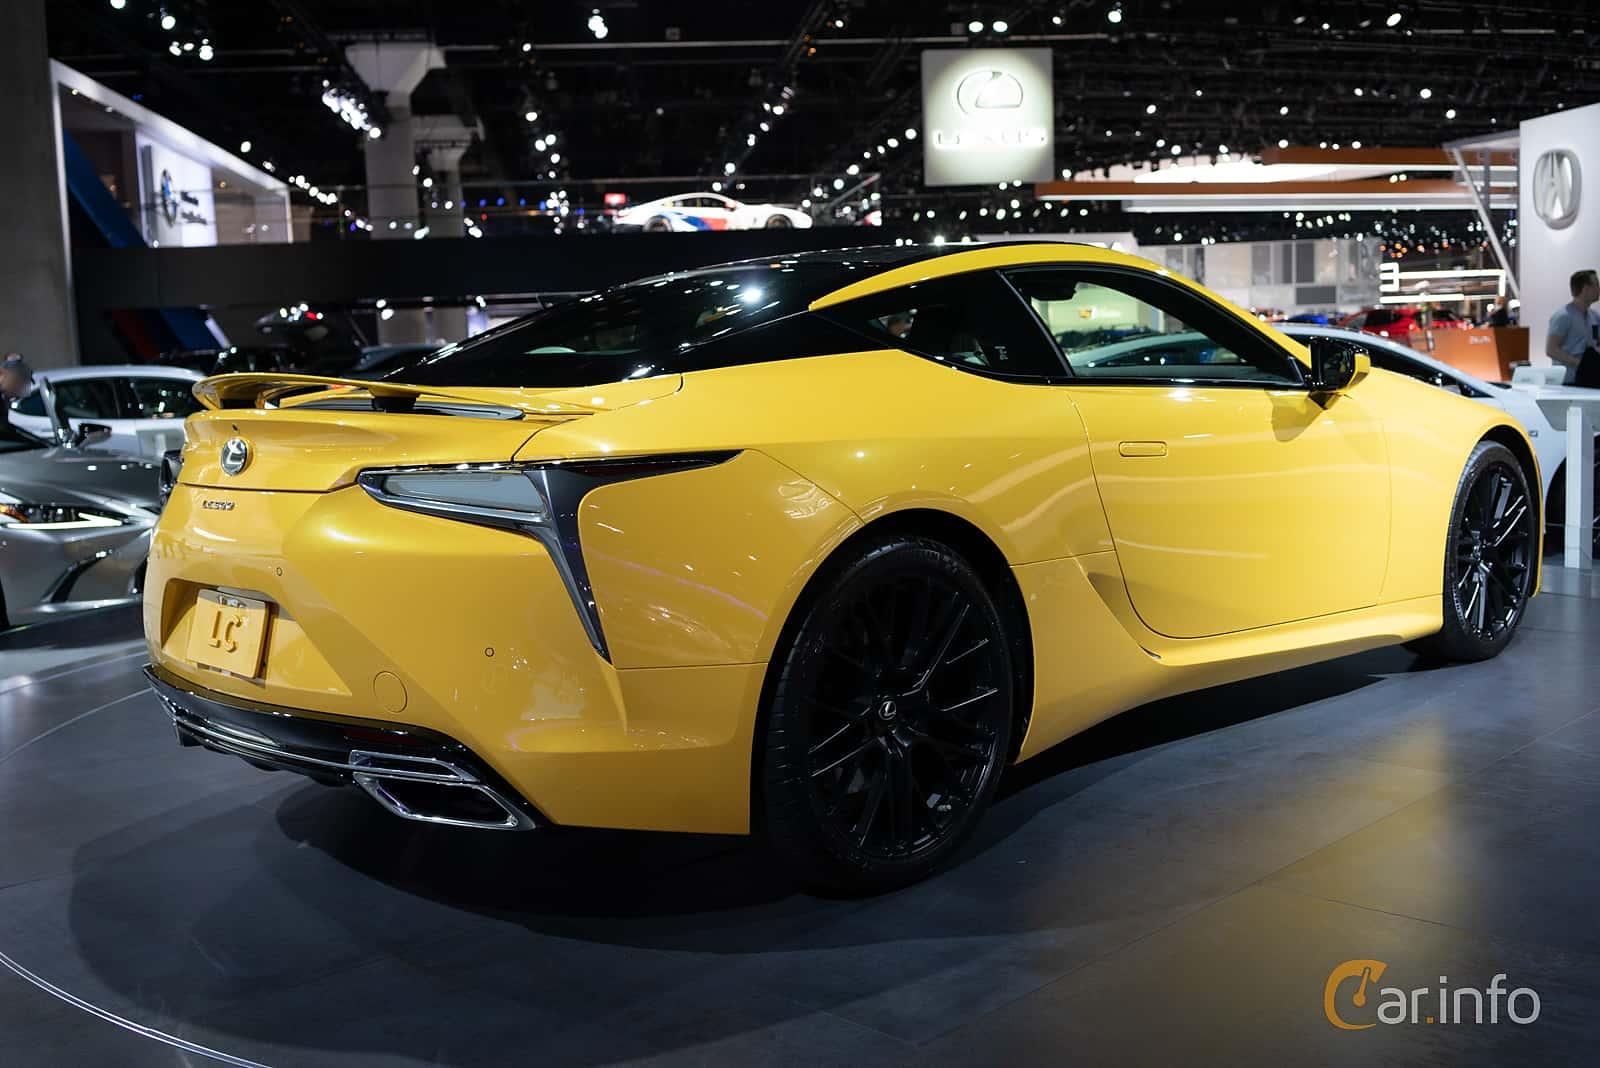 Lexus LC 500 5.0 V8 Automatic, 477hp, 2019 at LA Motor Show 2018